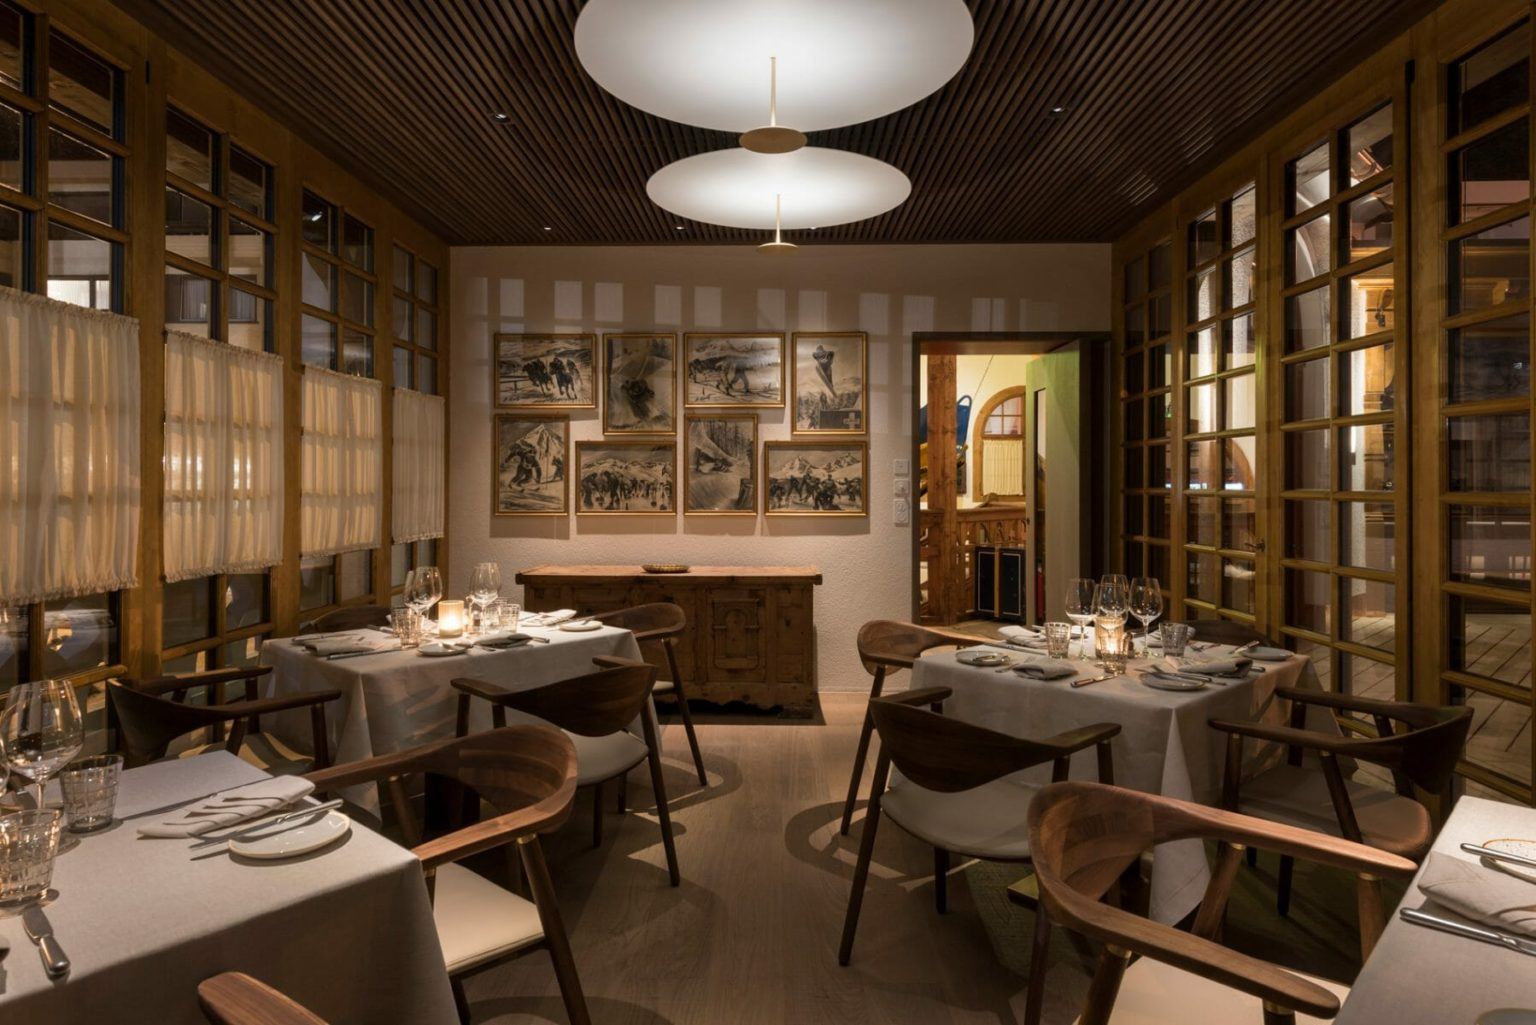 KulmCountryClub_Innen_Restaurant6Bar_TagNigelYoung-FosterPartner-1798x1200